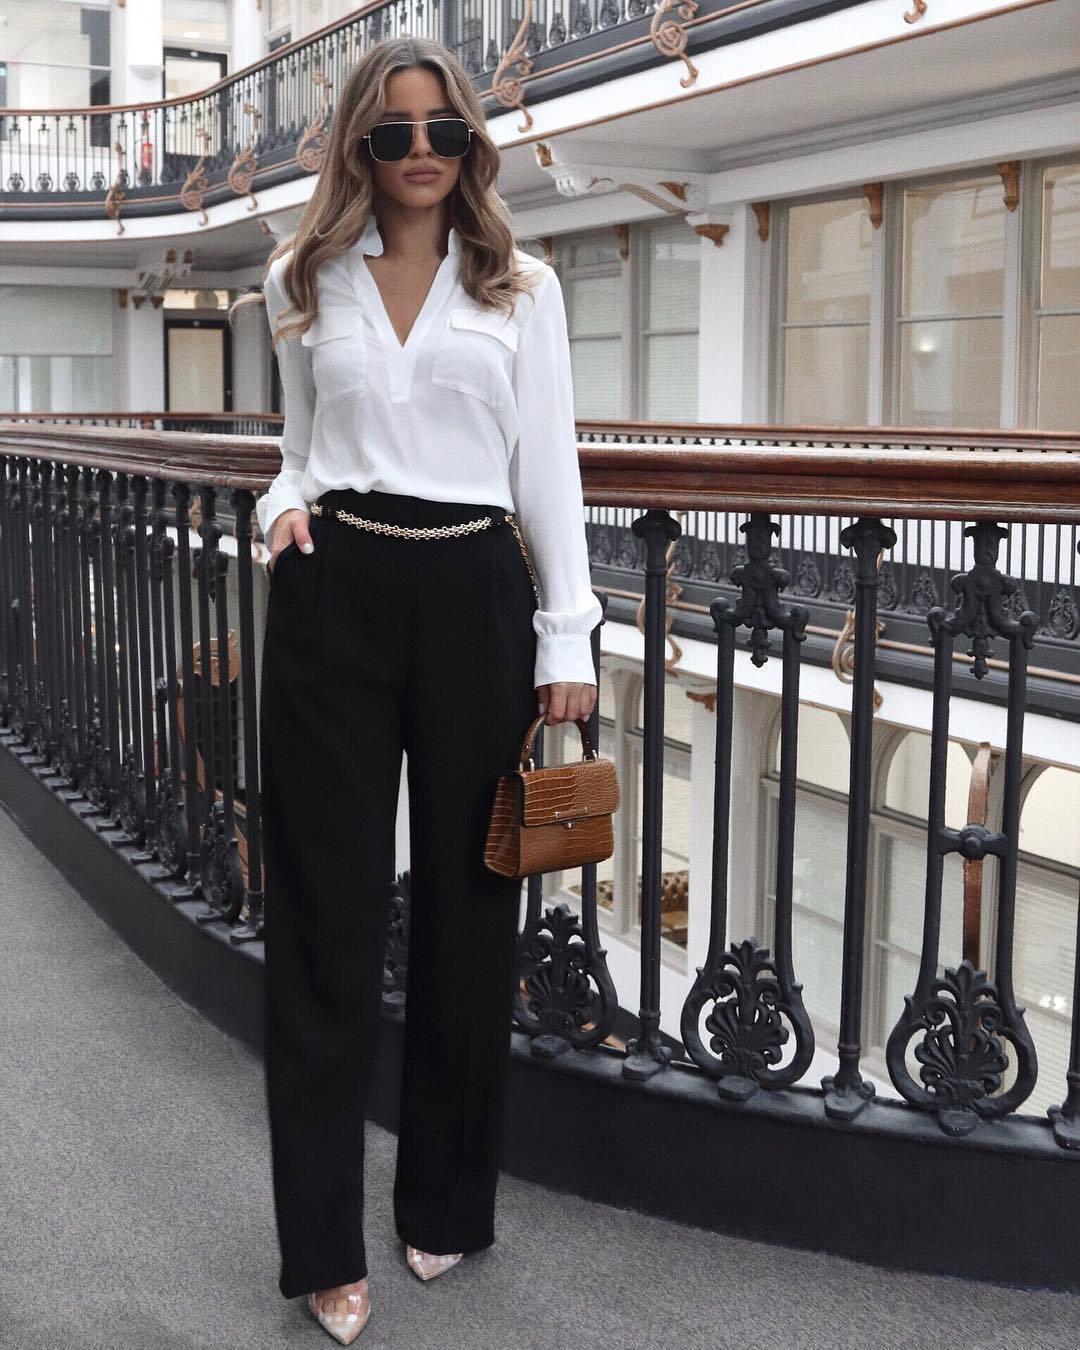 top white shirt black pants high waisted pants pumps brown bag handbag sunglasses classy